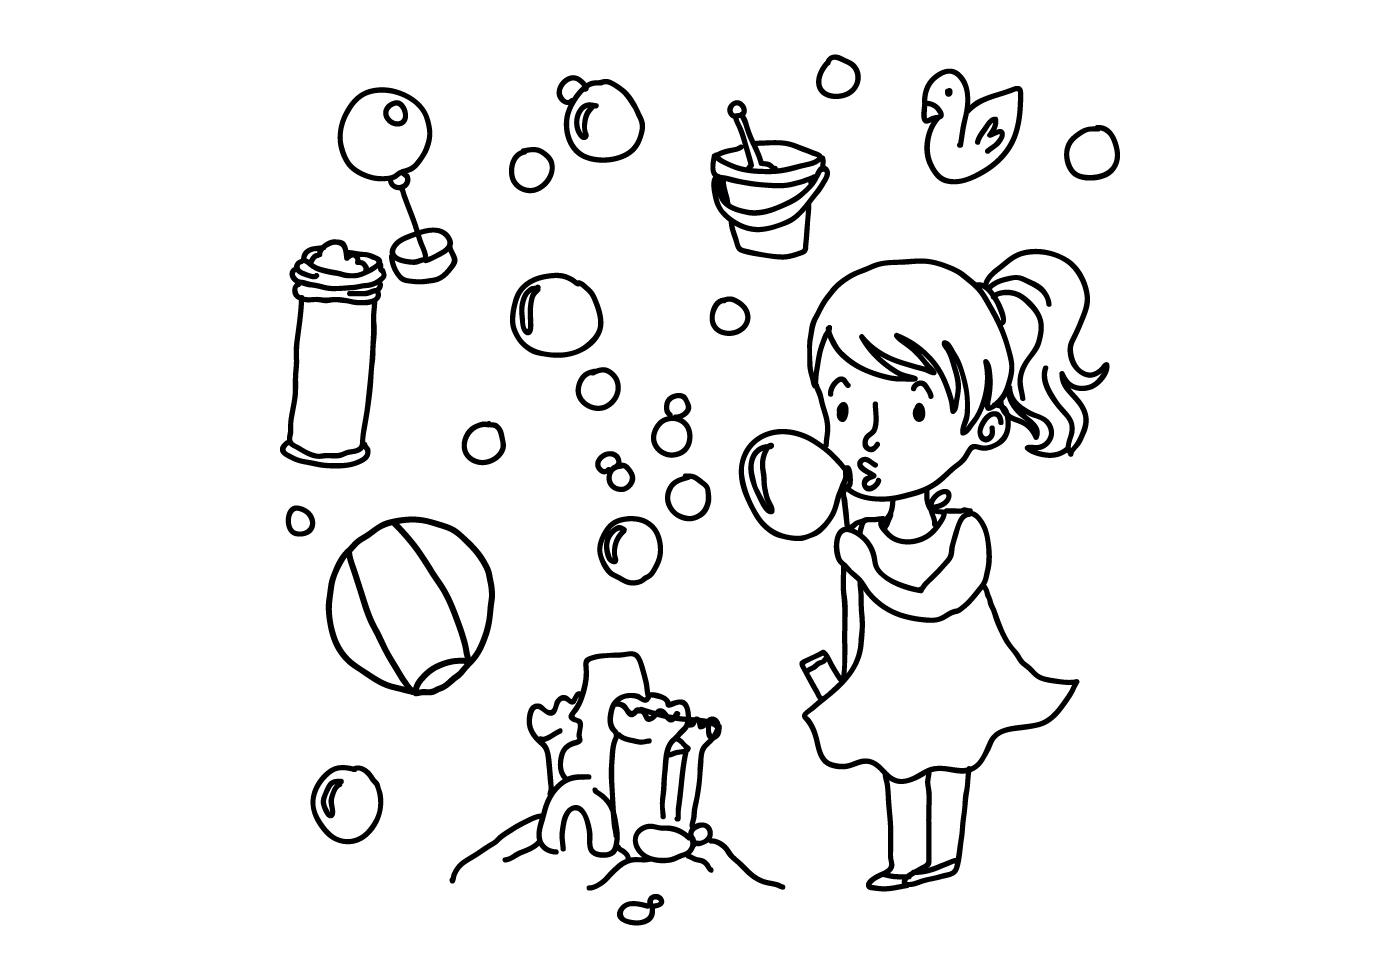 Bubbles And Toy Doodle Vectors For Children